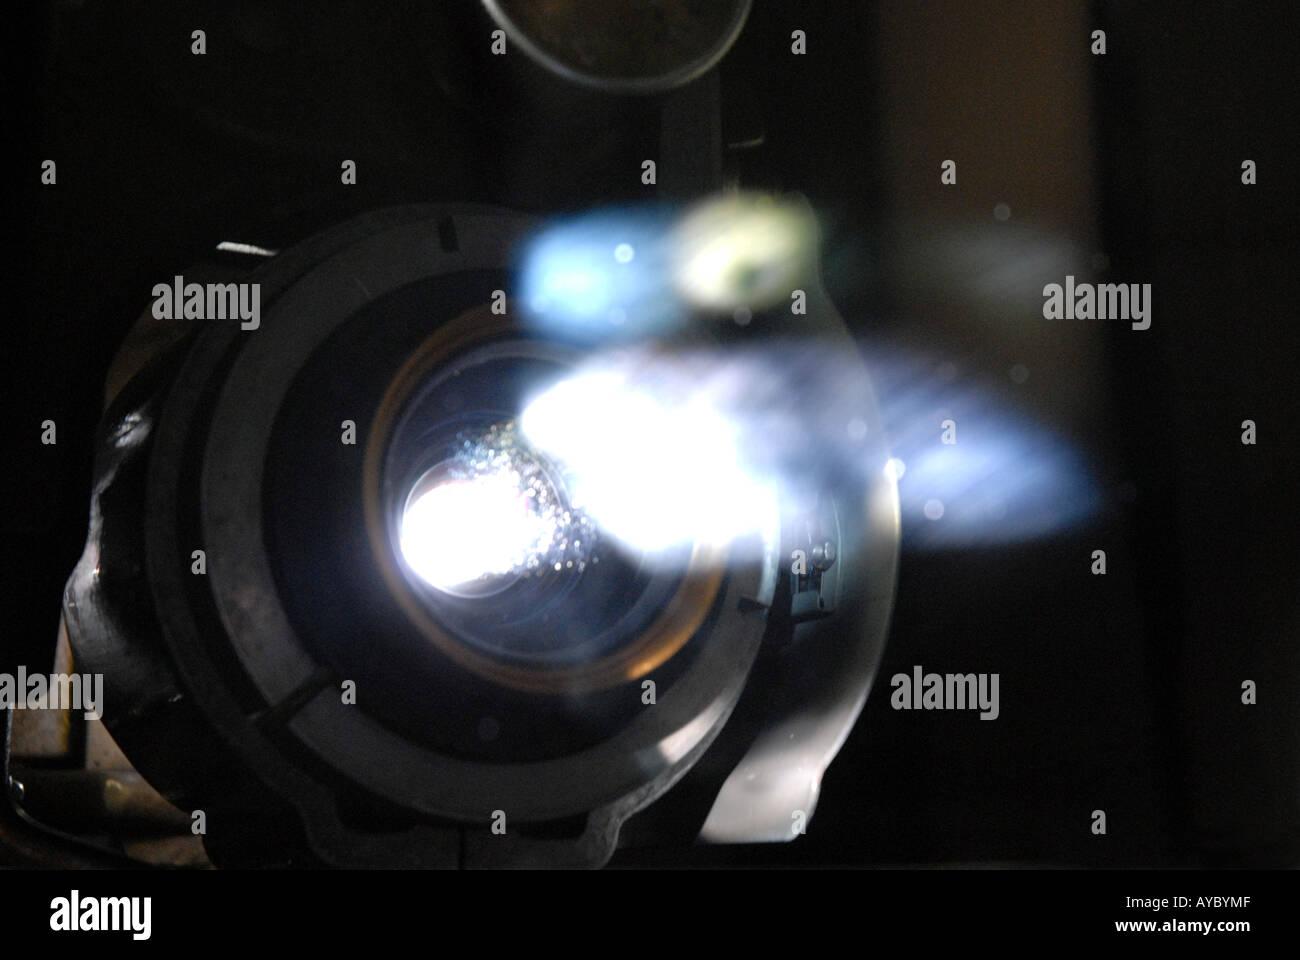 Film Projektor Linse Bild Stockbild